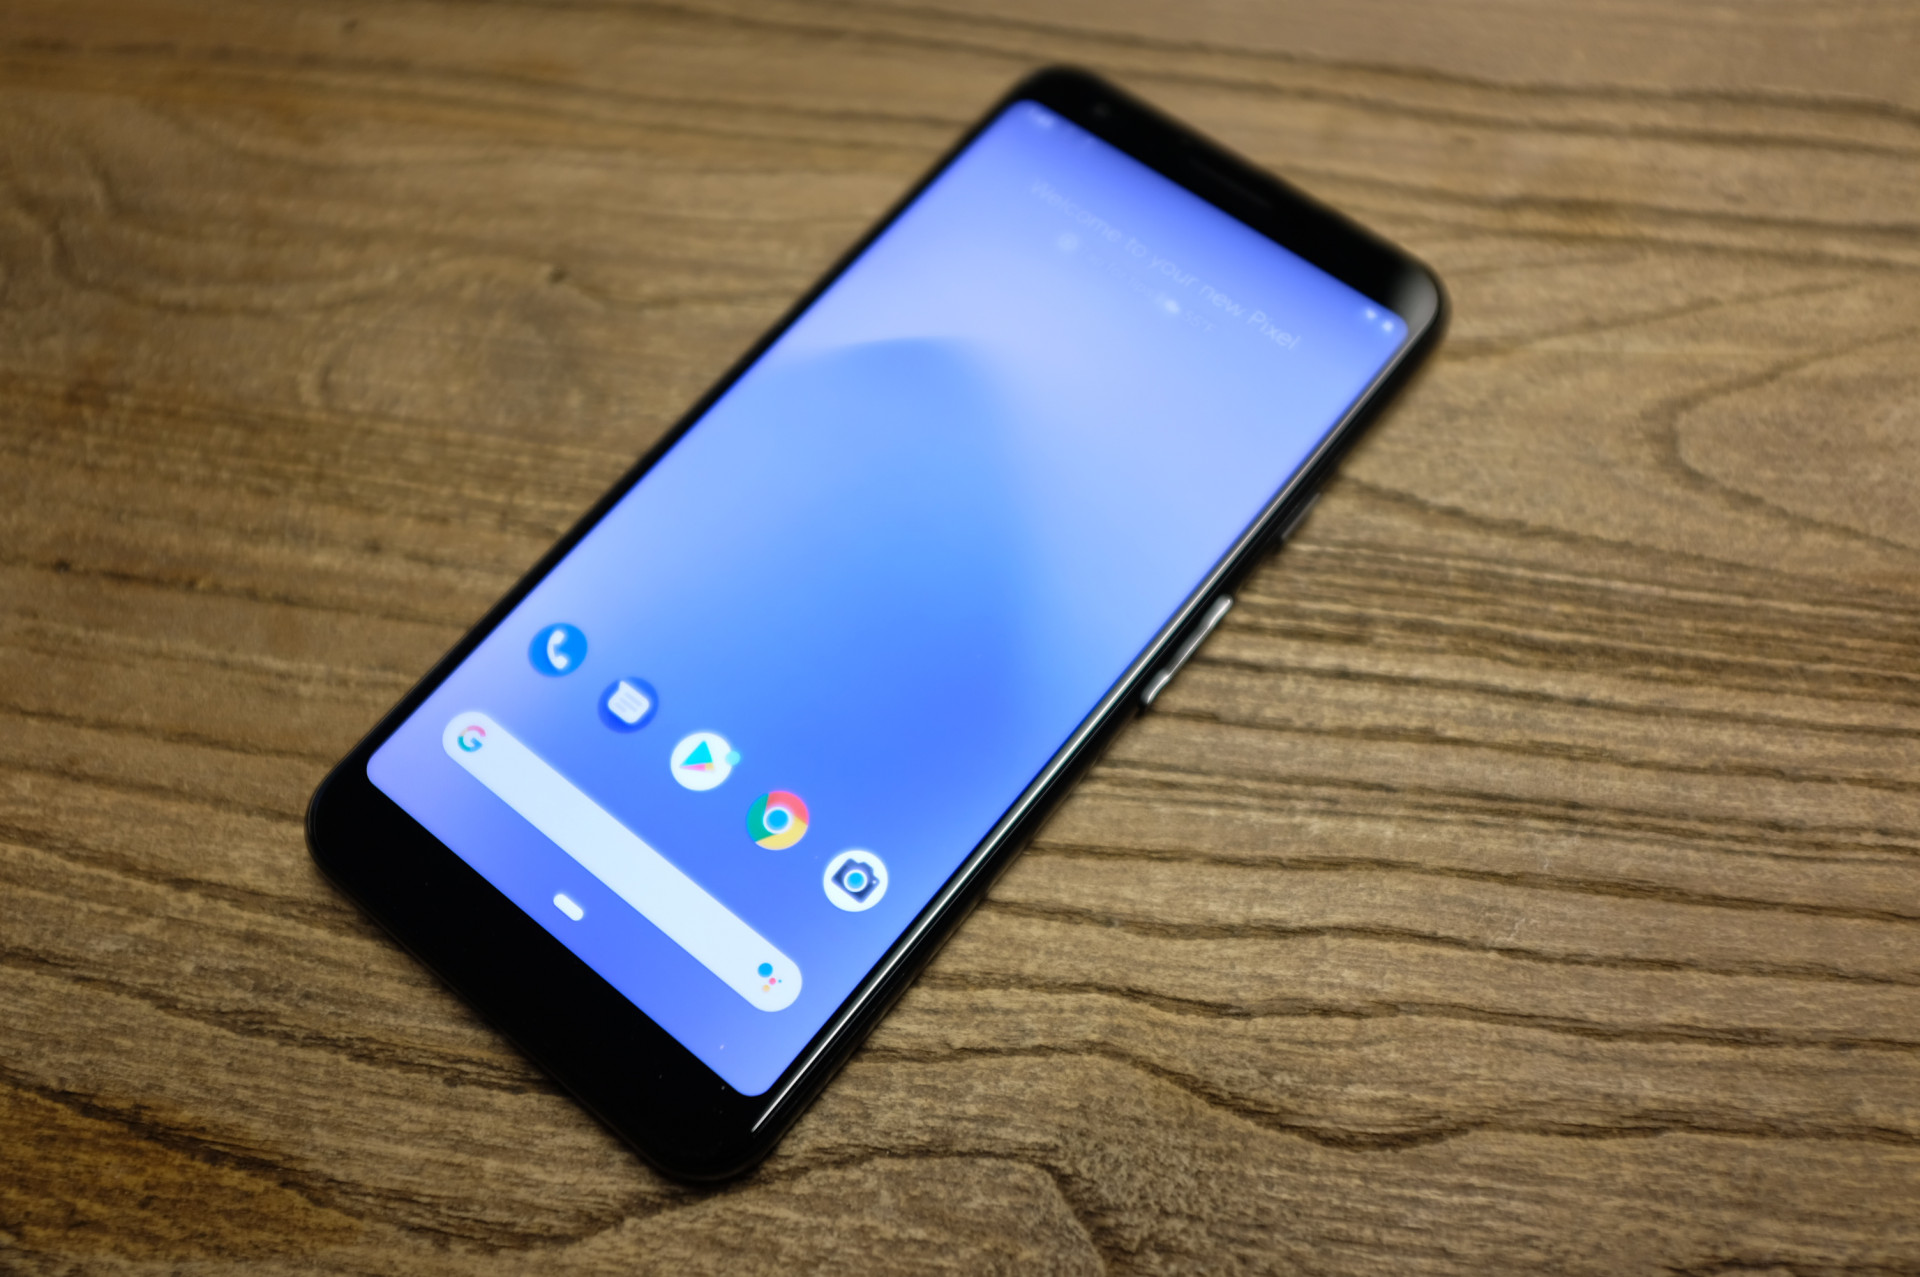 Google I/O 2019 消息汇总:Pixel 3a、Nest Hub Max,以及 AI 让生活更美好